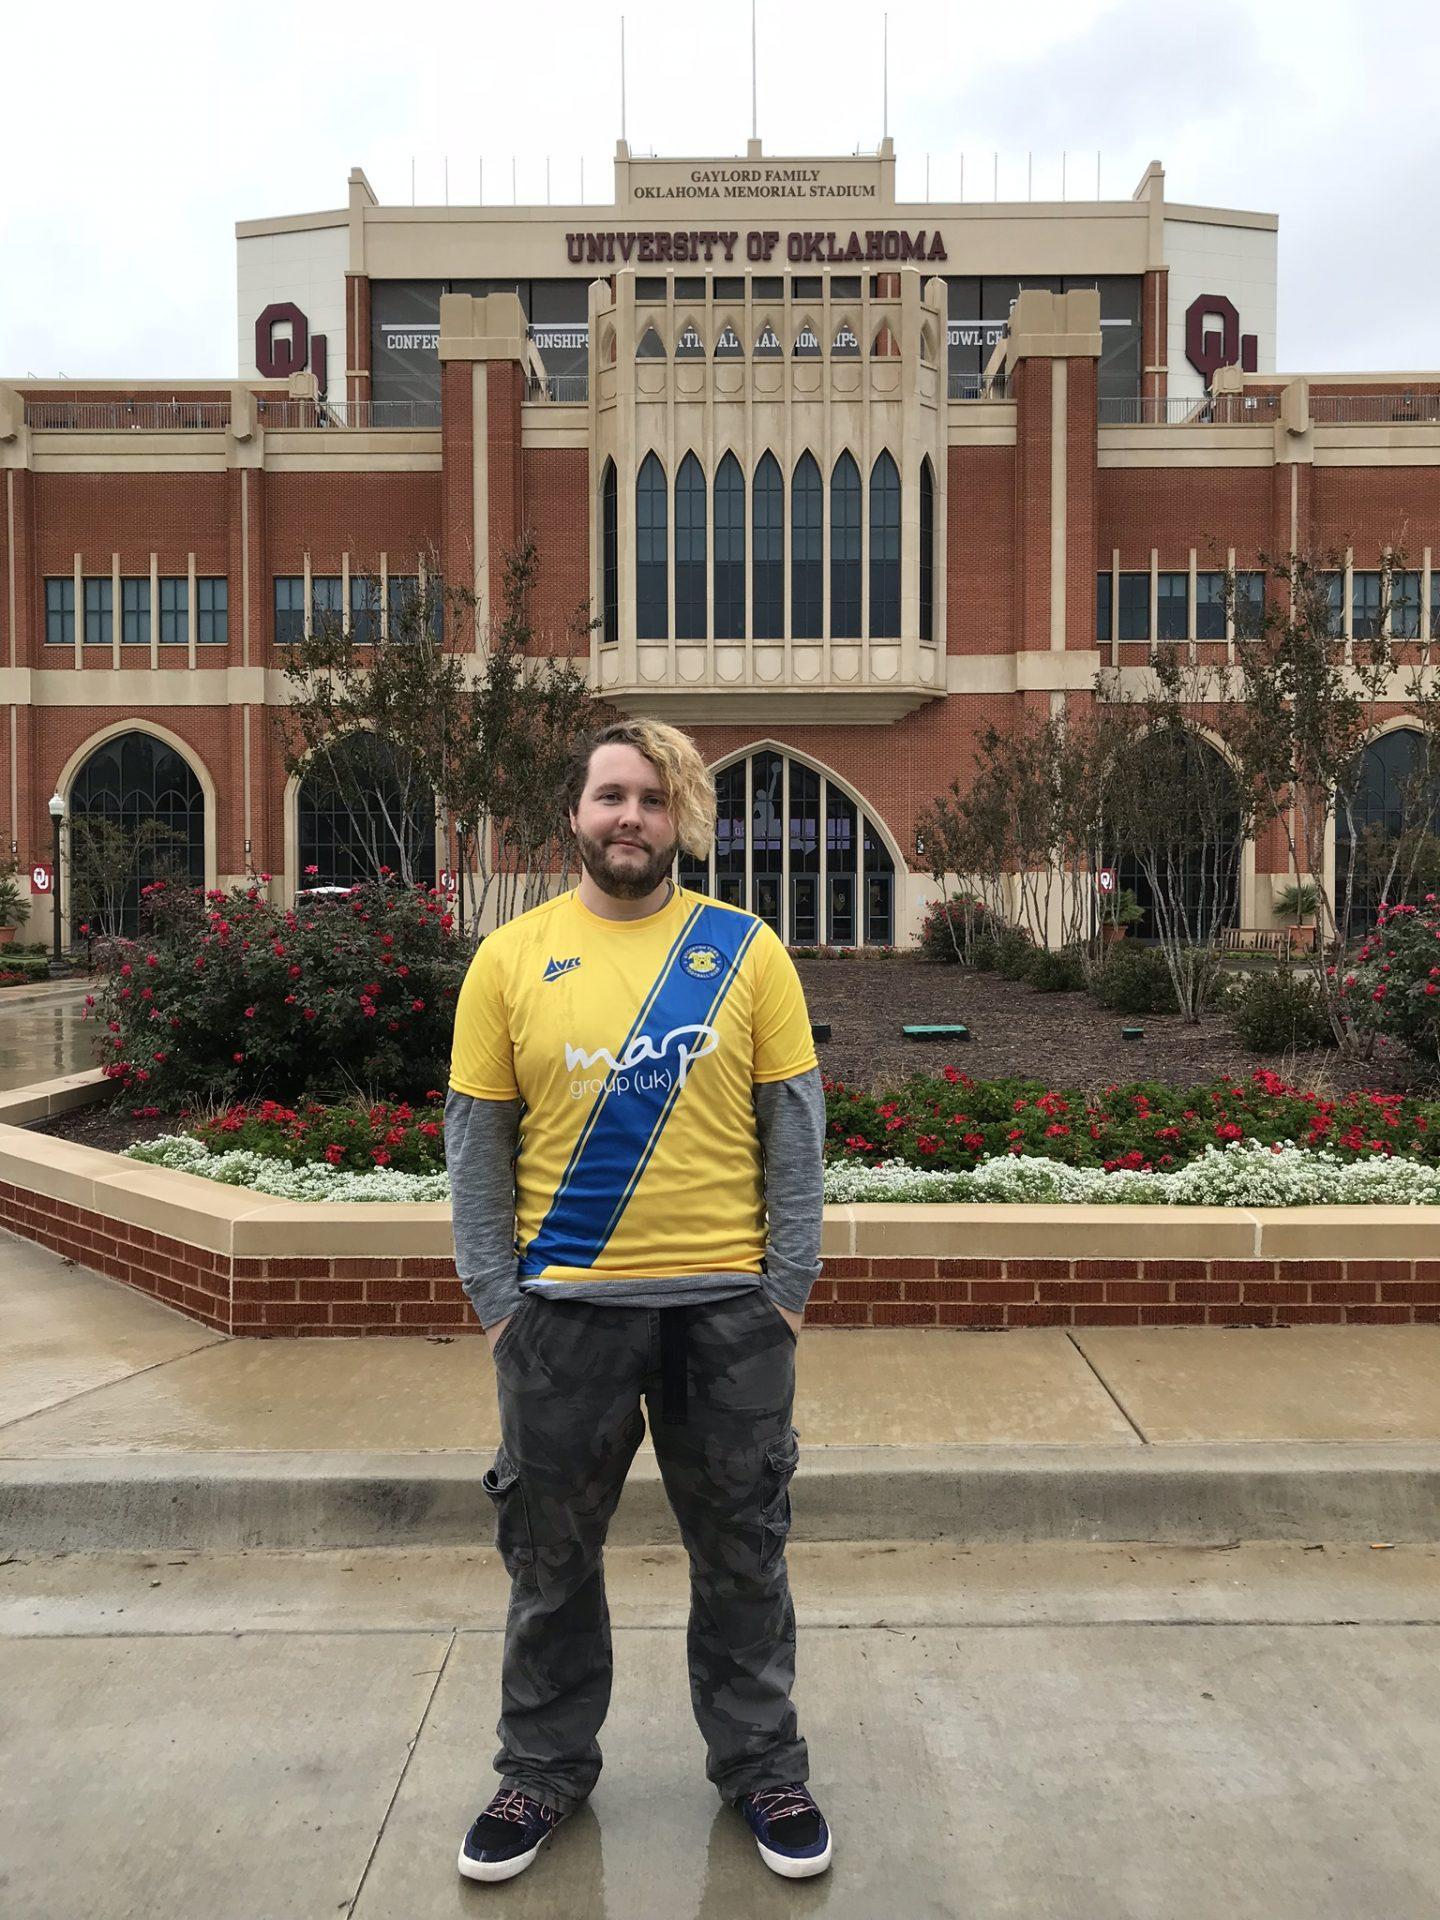 Oklahoma-Gaylord-Memorial-Stadium-Dave-Lawson